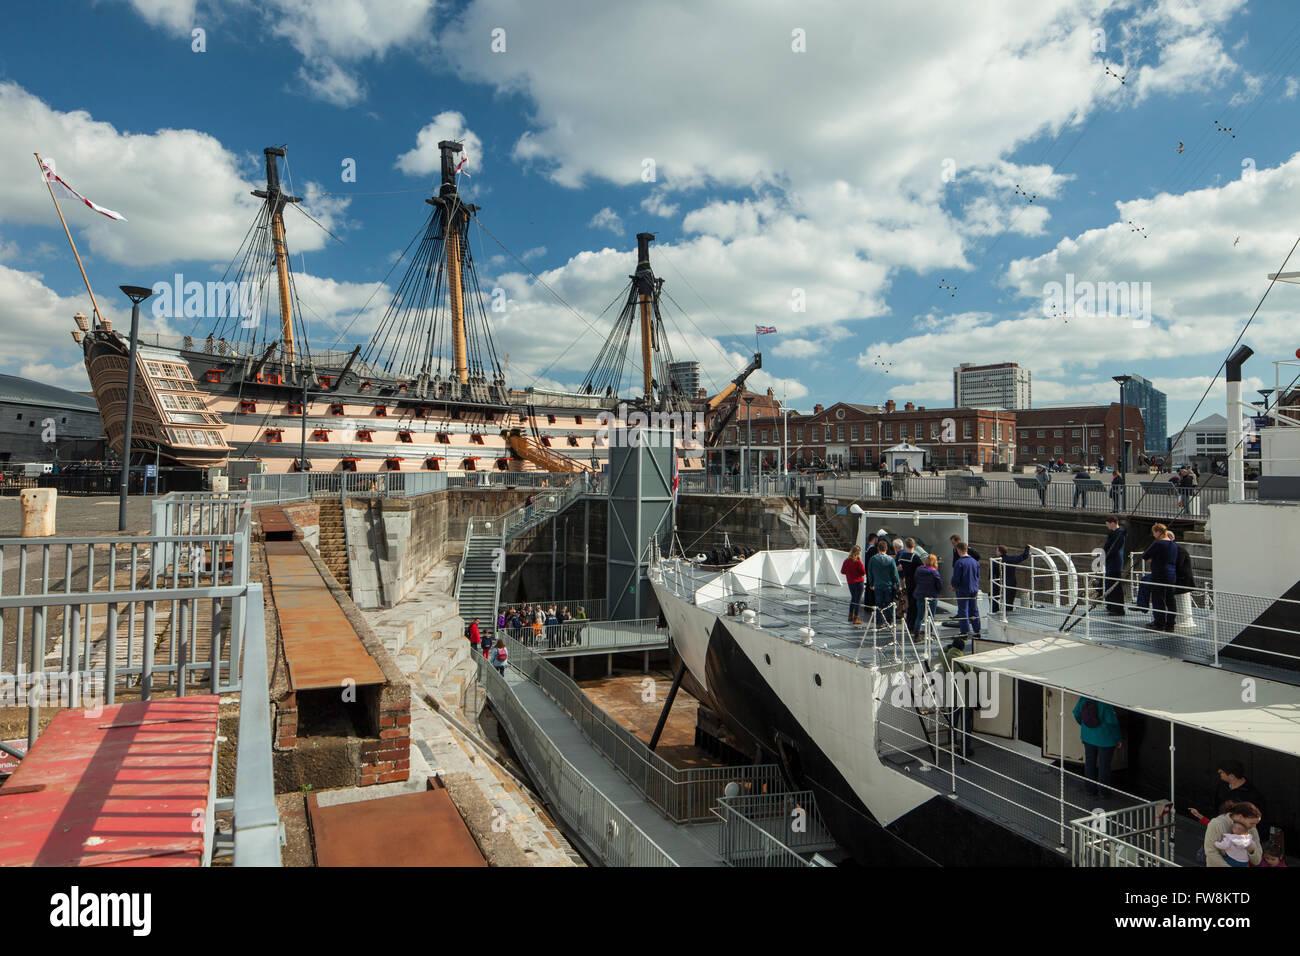 Portsmouth Historic Dockyard. - Stock Image